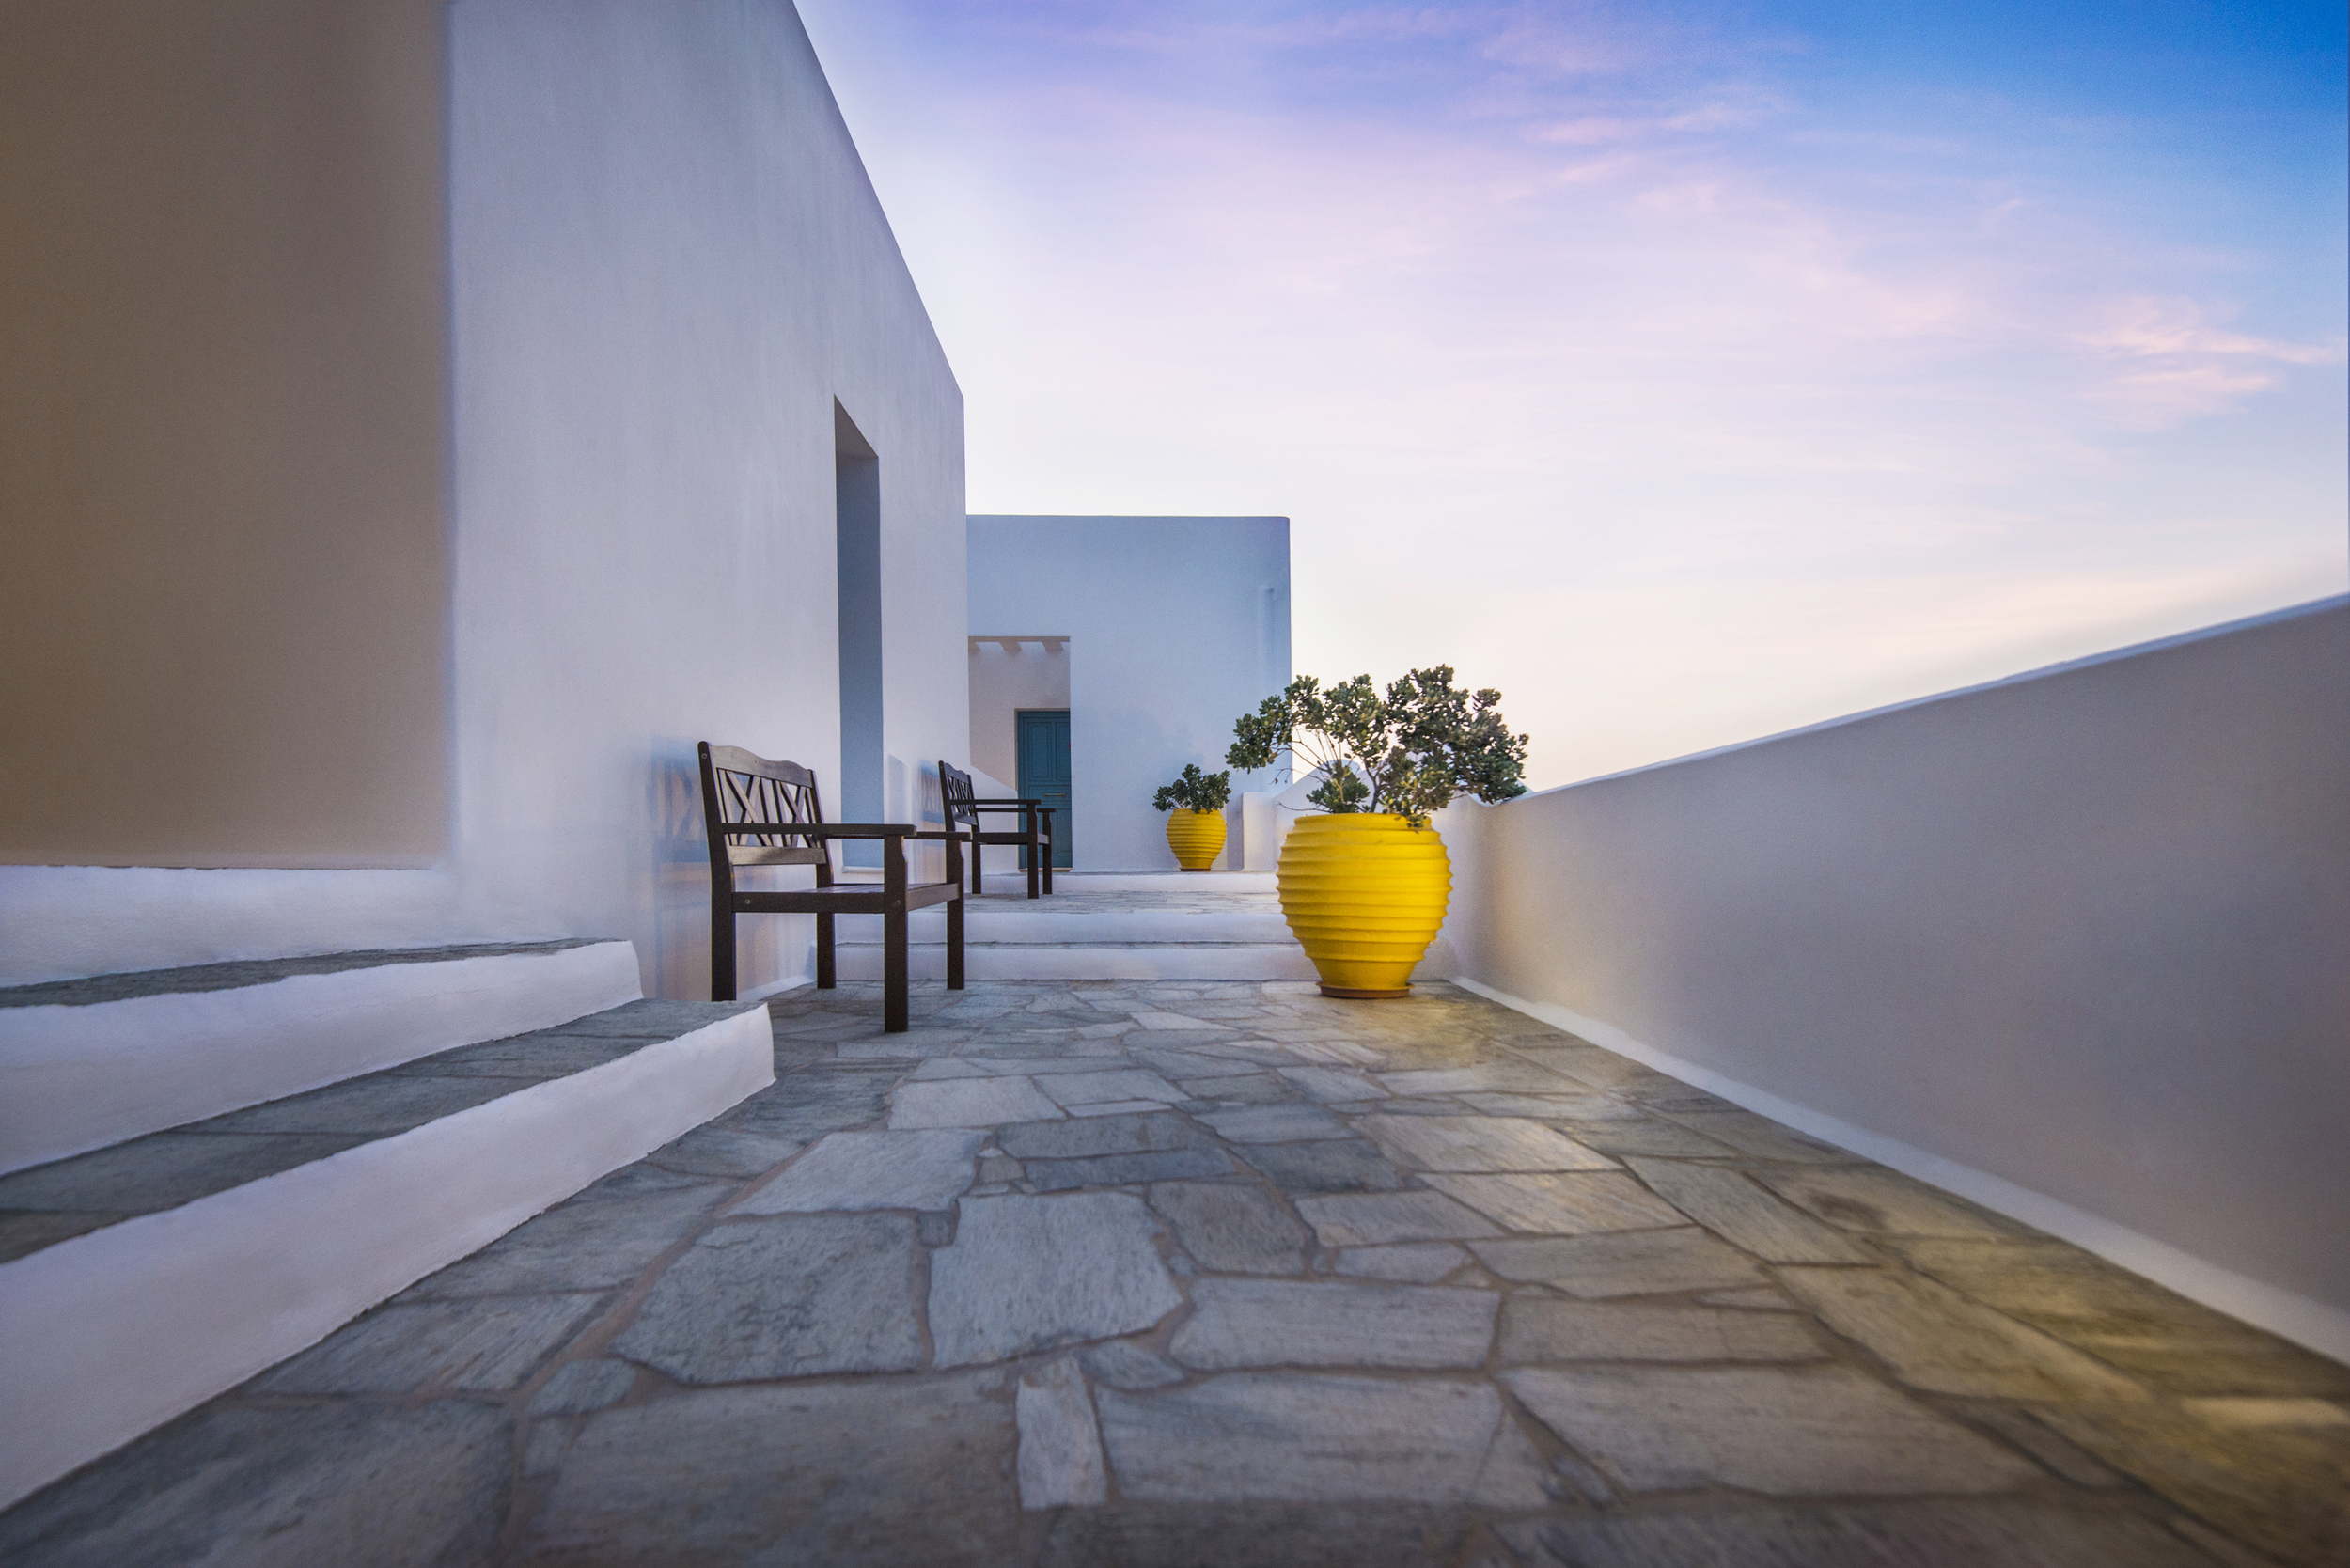 GREECE_FINAL_SELECTS_HOTEL_iPad-5.jpg